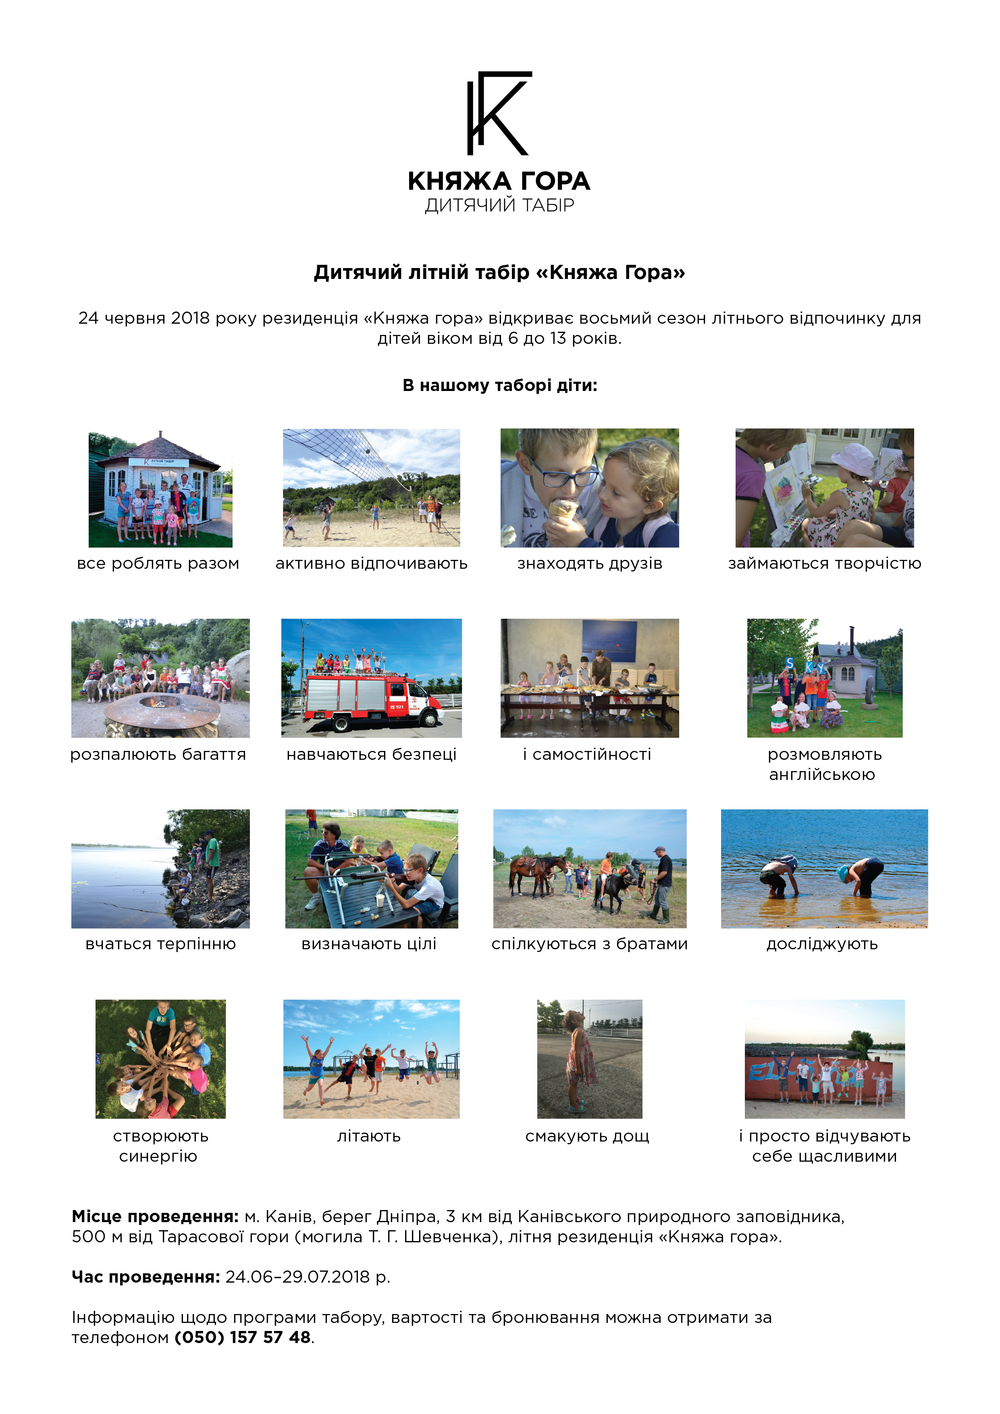 kh camp 2018 vertical align text bot-01.png